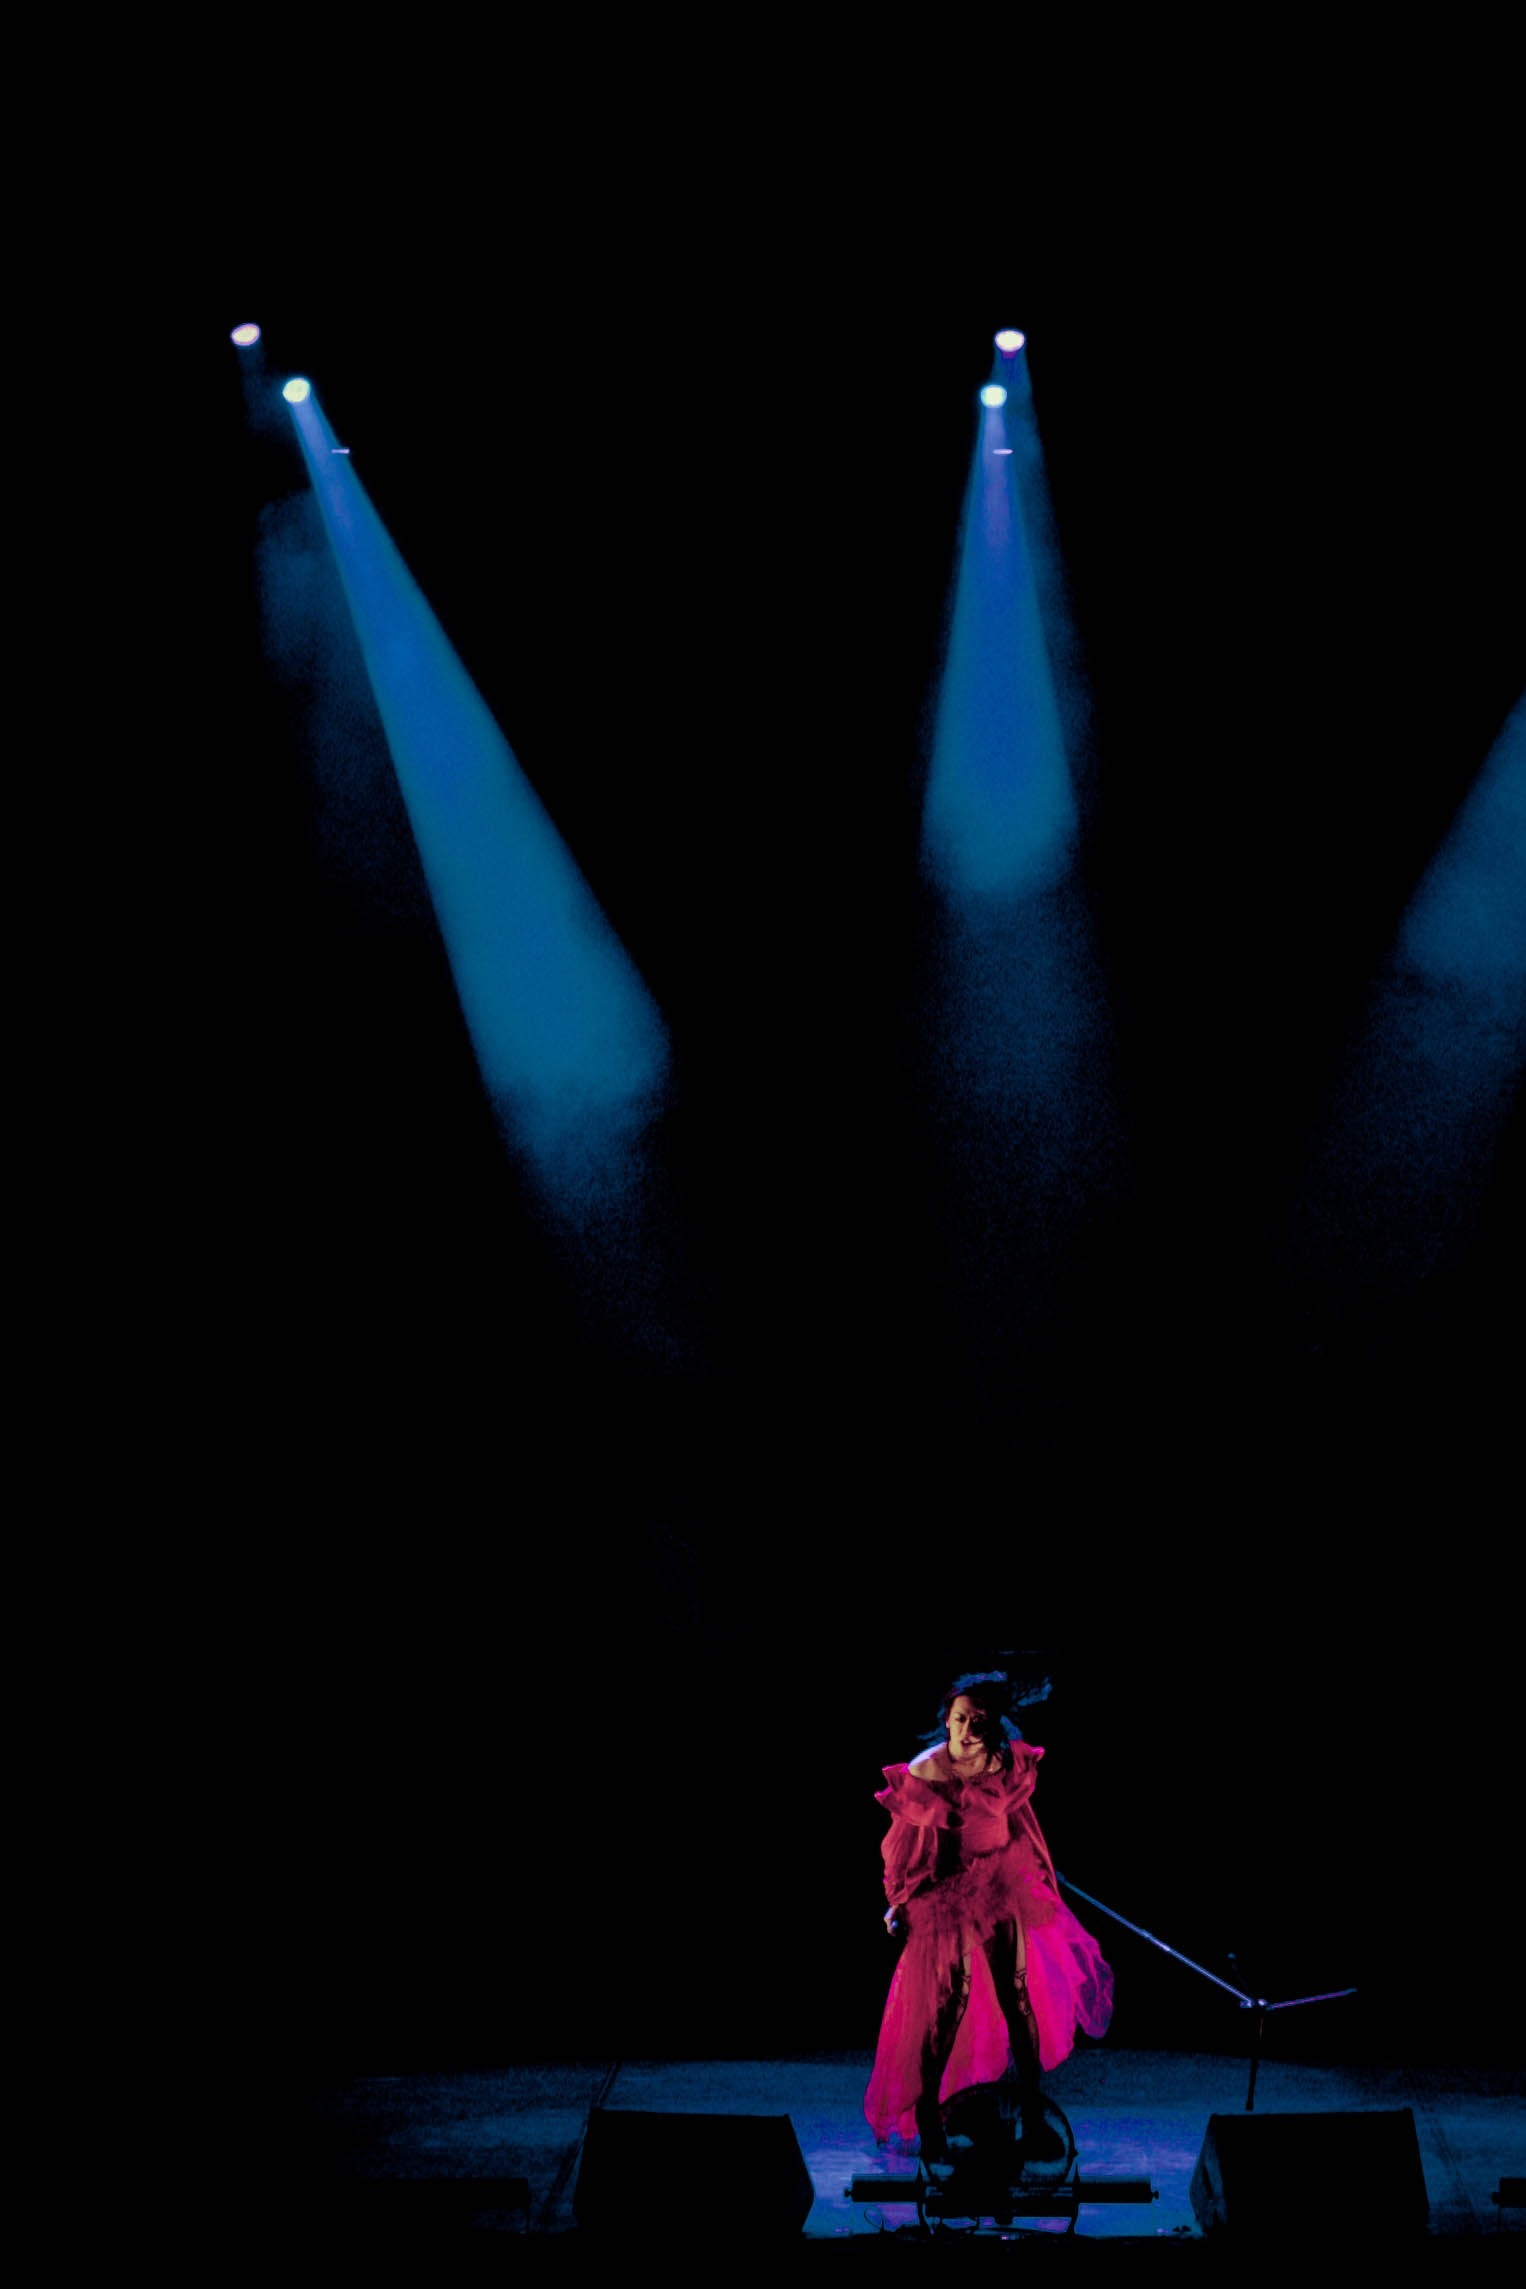 2018年12月20日 中央民族歌舞団民族劇院 北京公演の模様  Photo by Xiaobei/東京ゲゲゲイ北京公演((独)国際交流基金主催)より